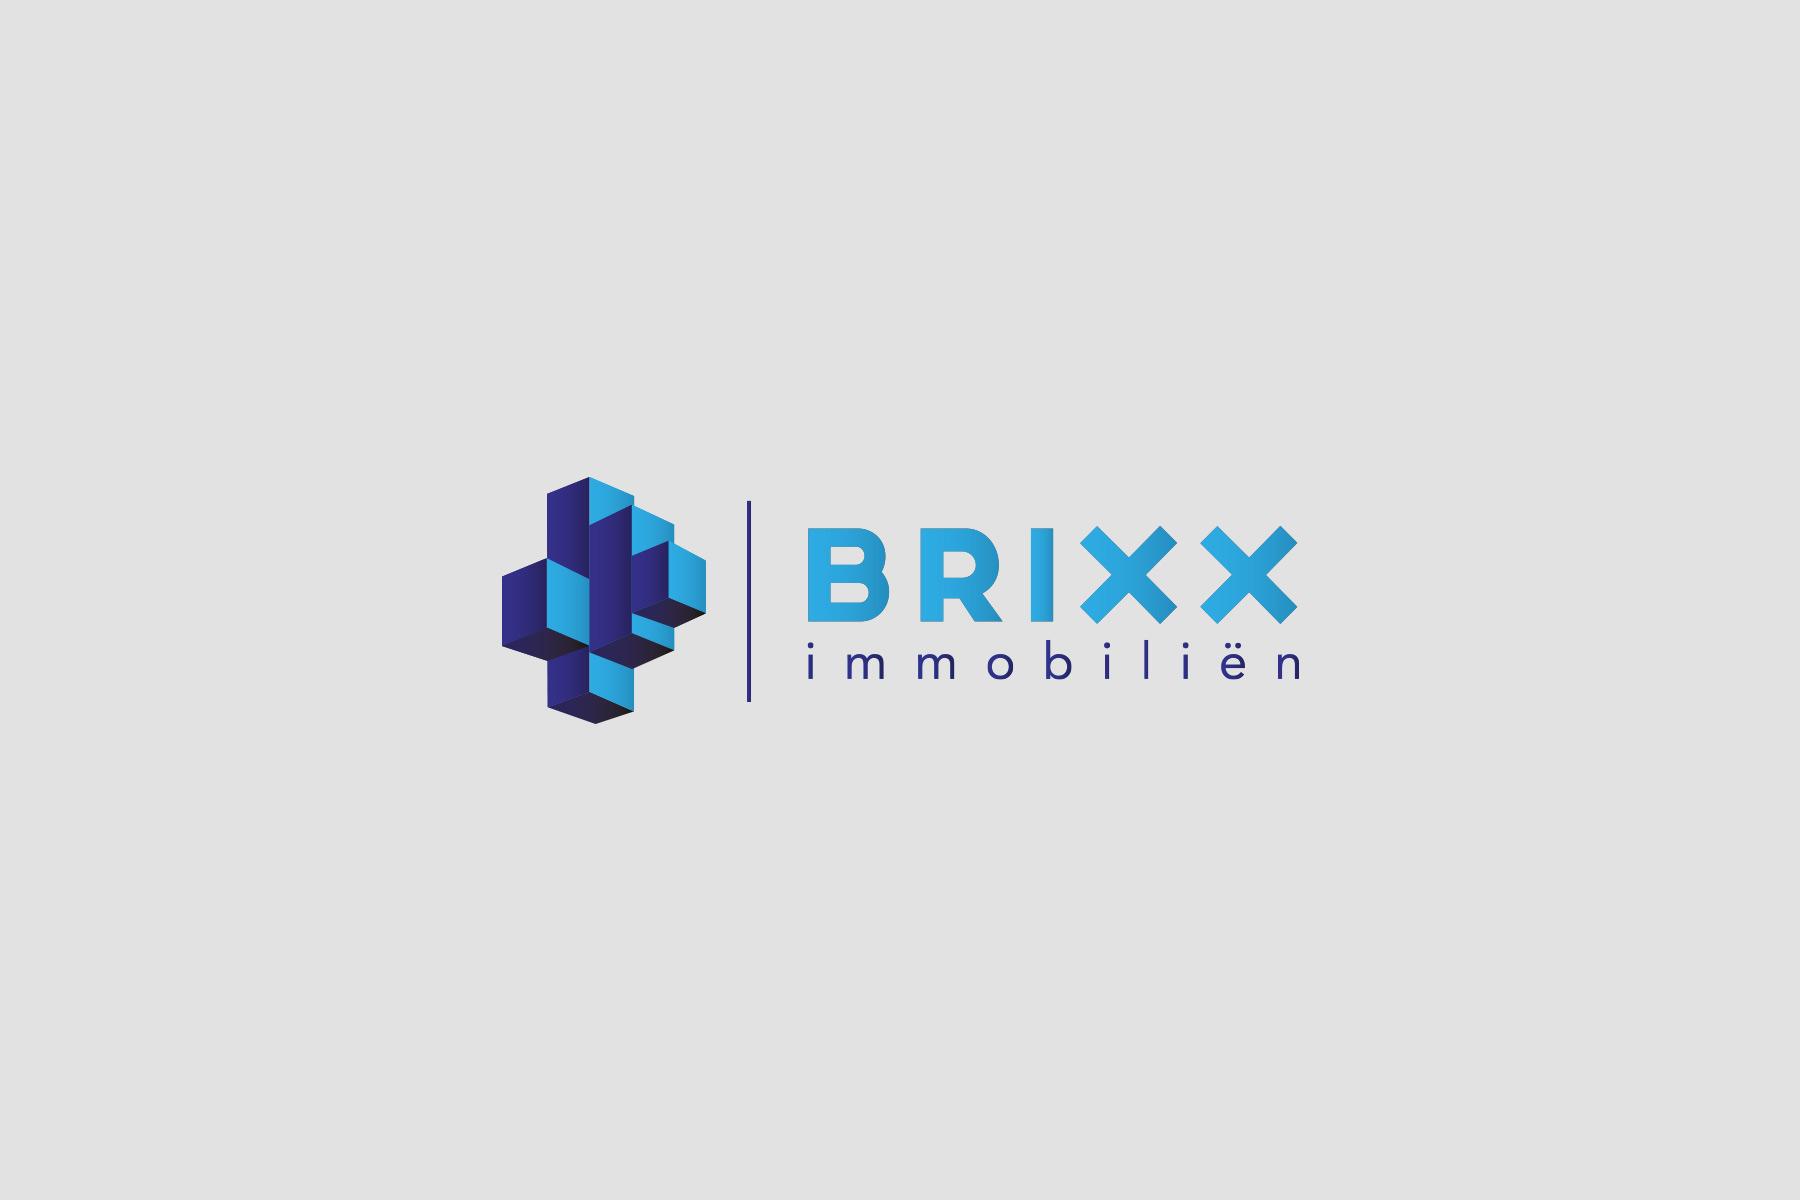 brixx003